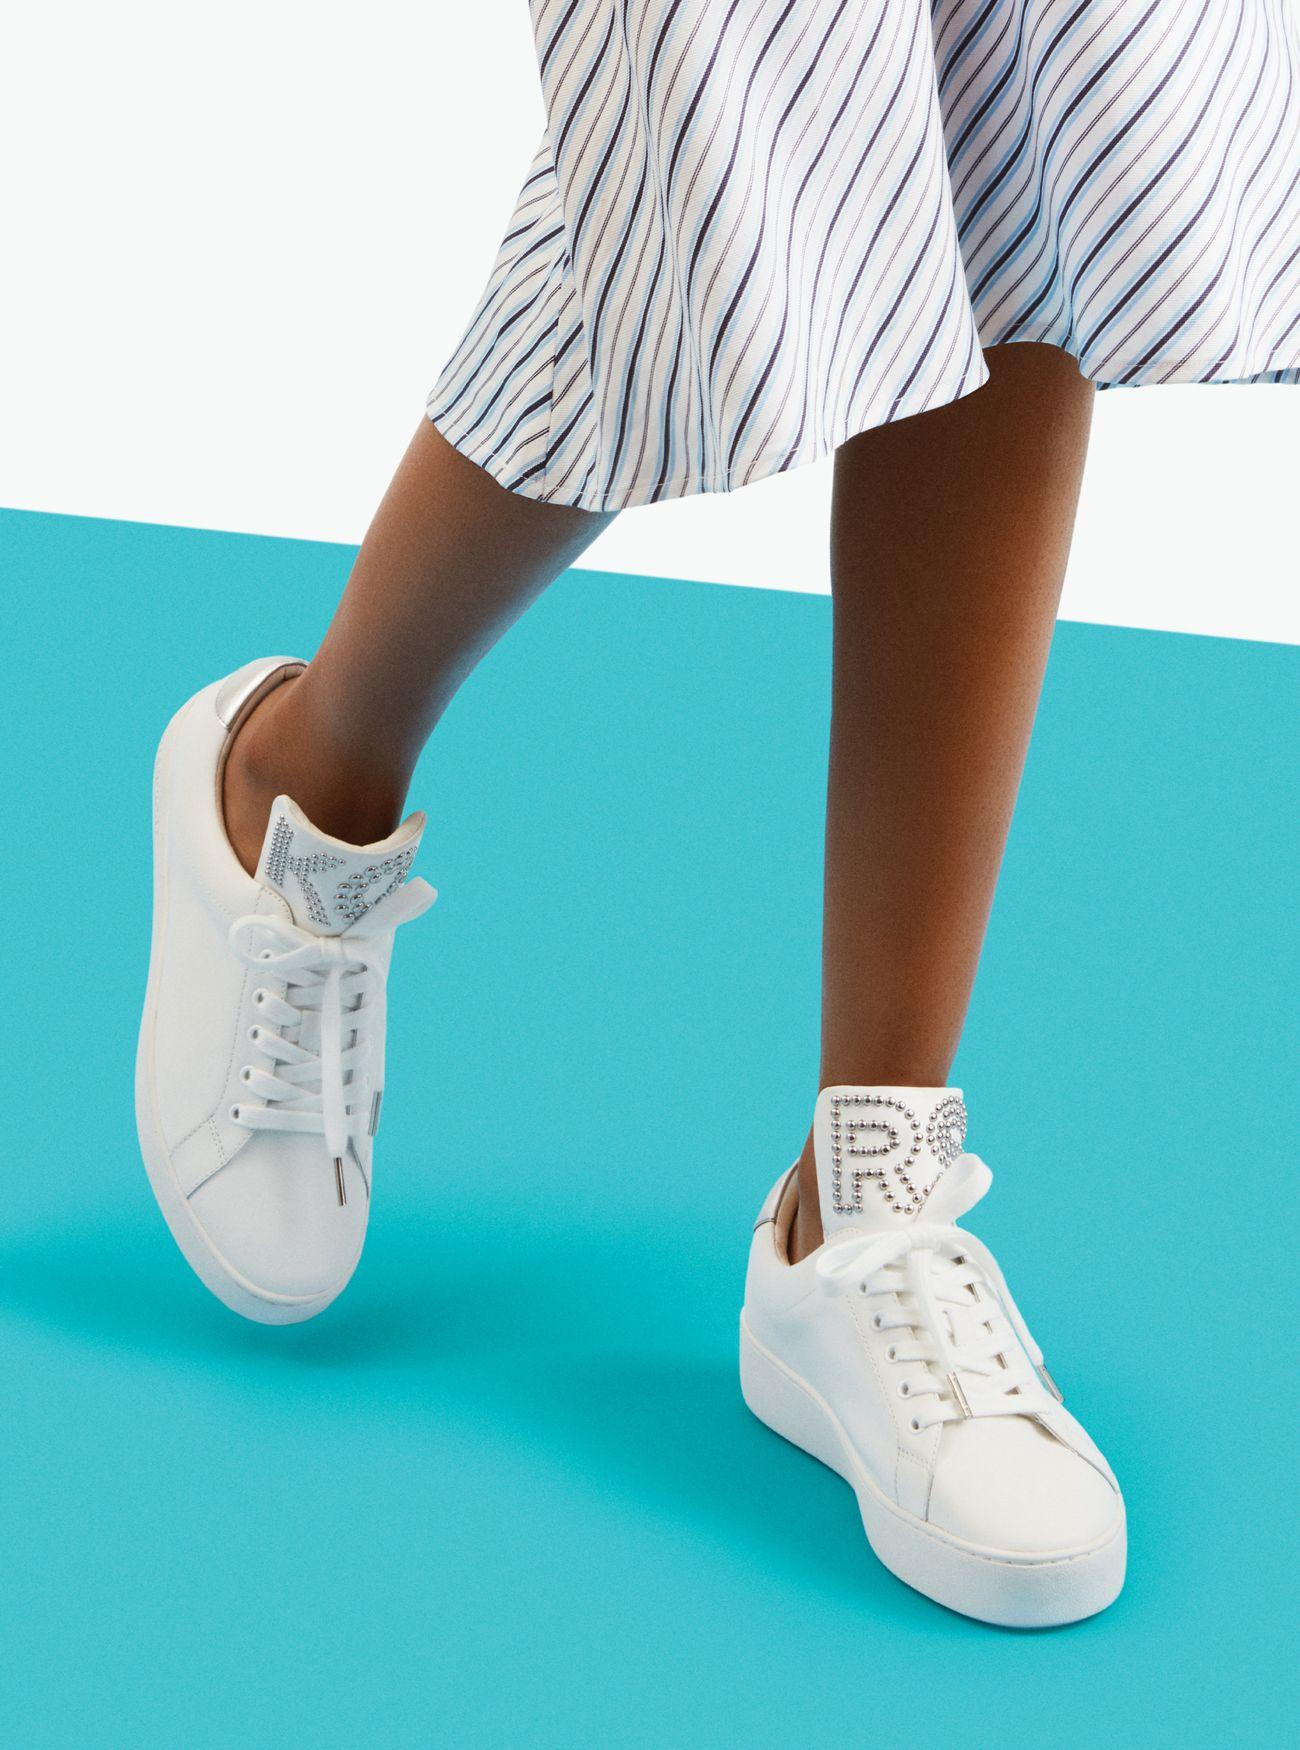 michael kors studded sneakers